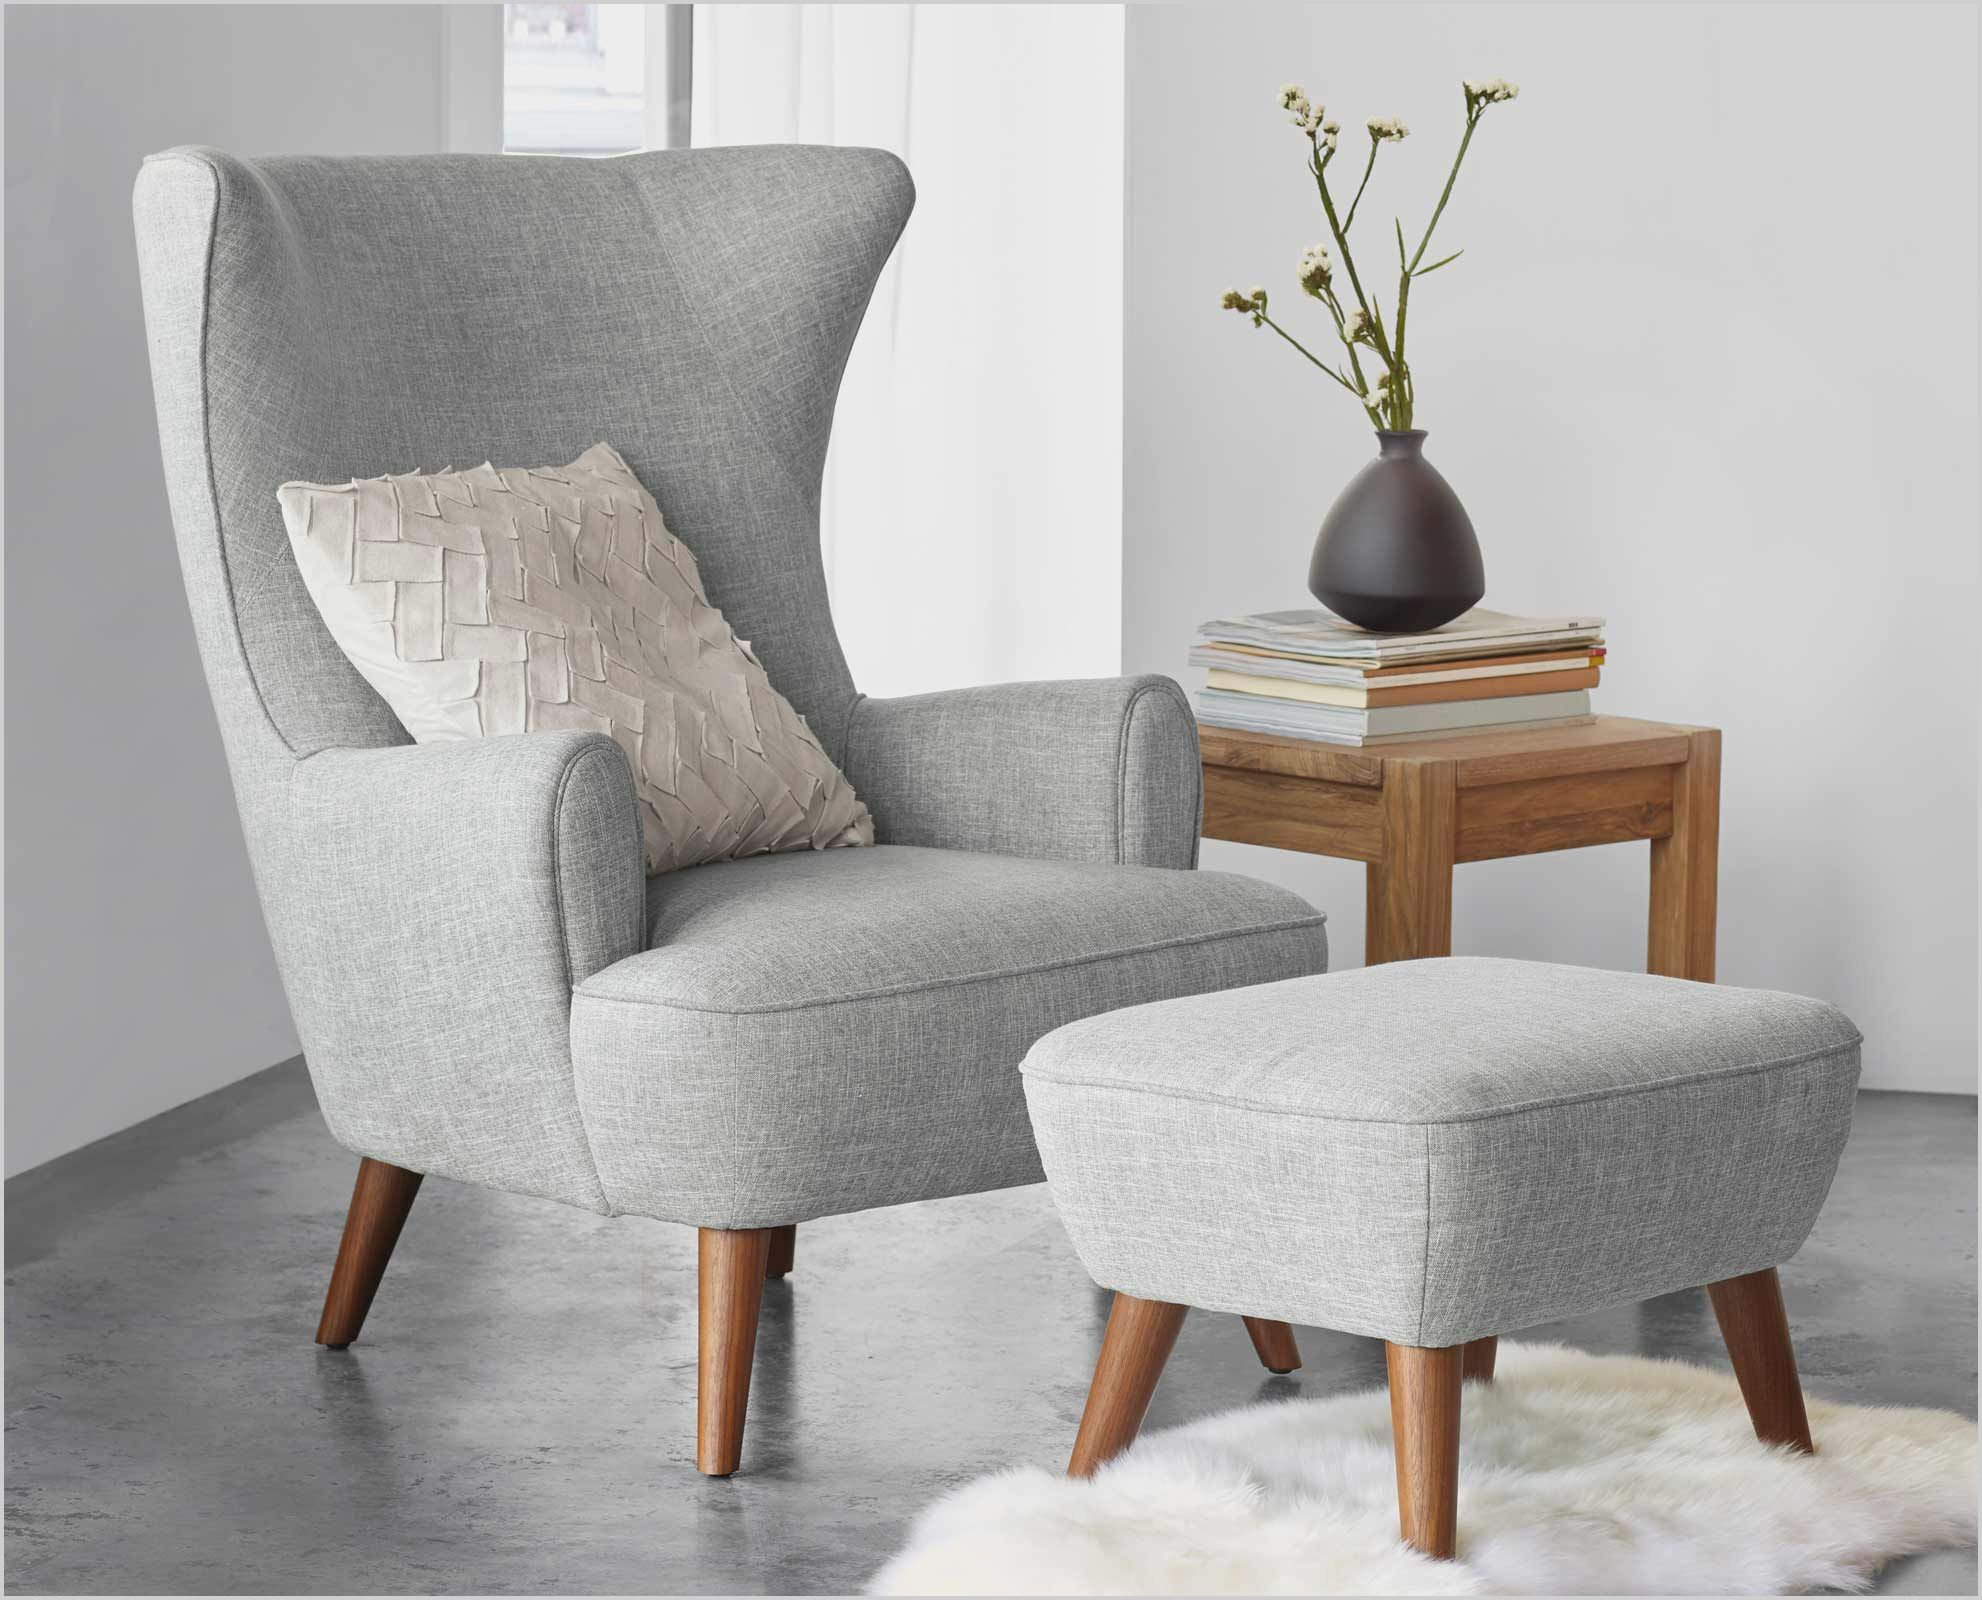 39++ Bedroom sofa ideas quora cpns 2021